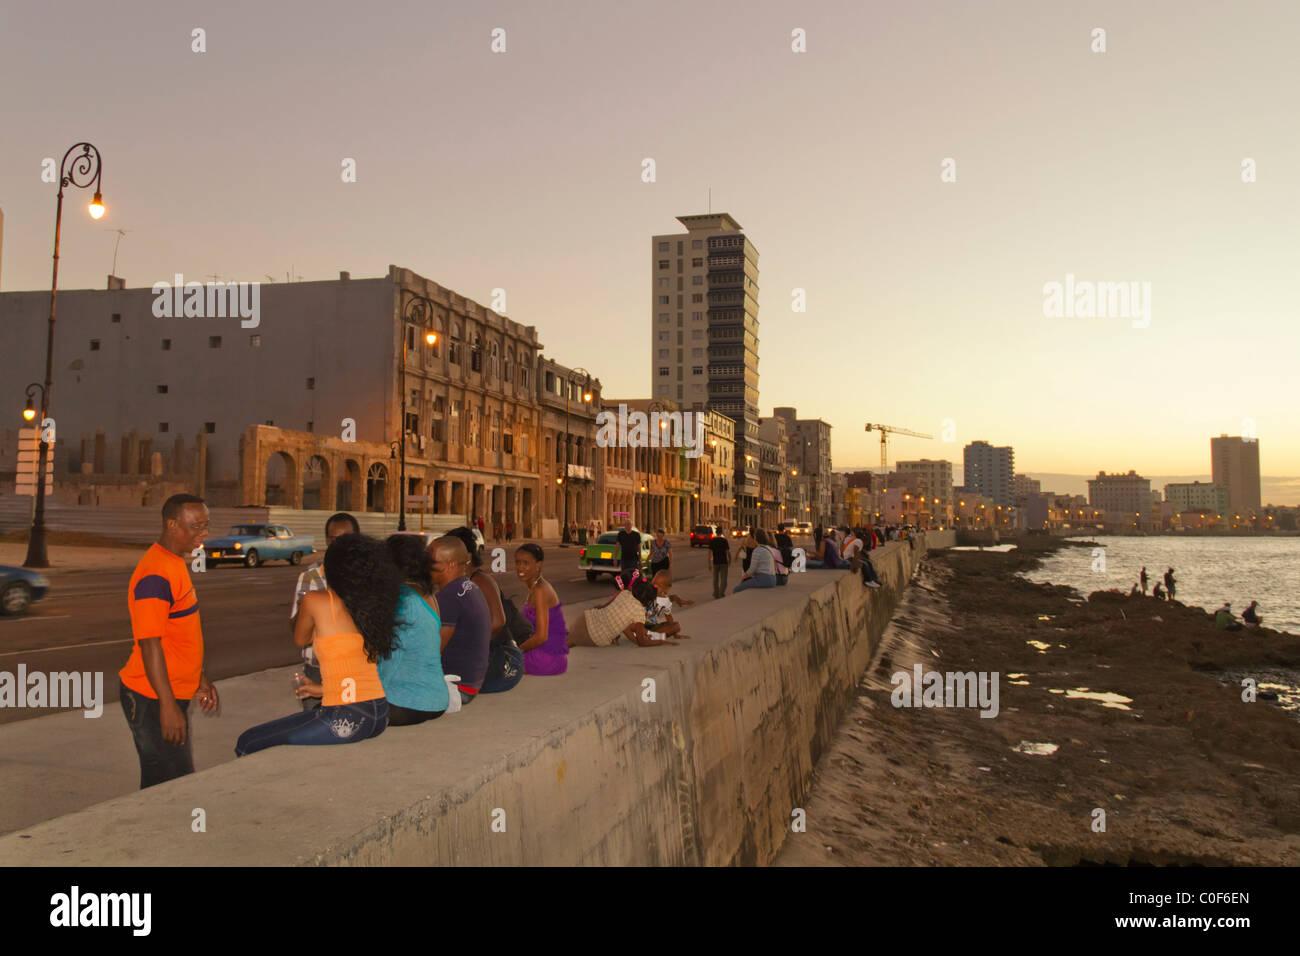 Malecon Promenade bei Sonnenuntergang, Havanna Vieja, Kuba Stockfoto